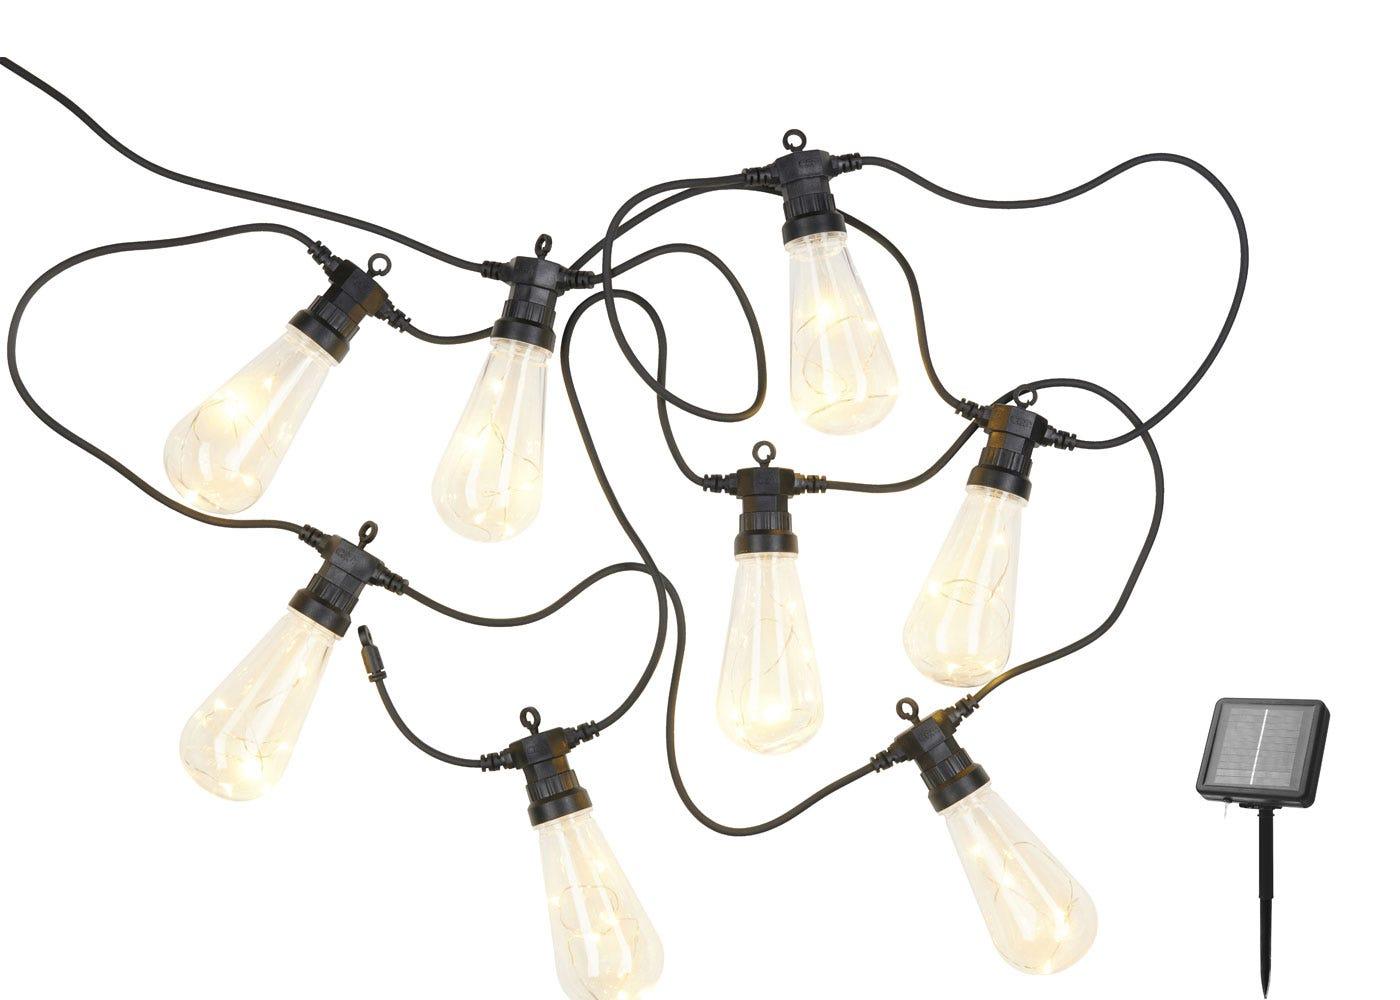 As shown: Lasse Solar Outdoor String Lights Clear Starter Set